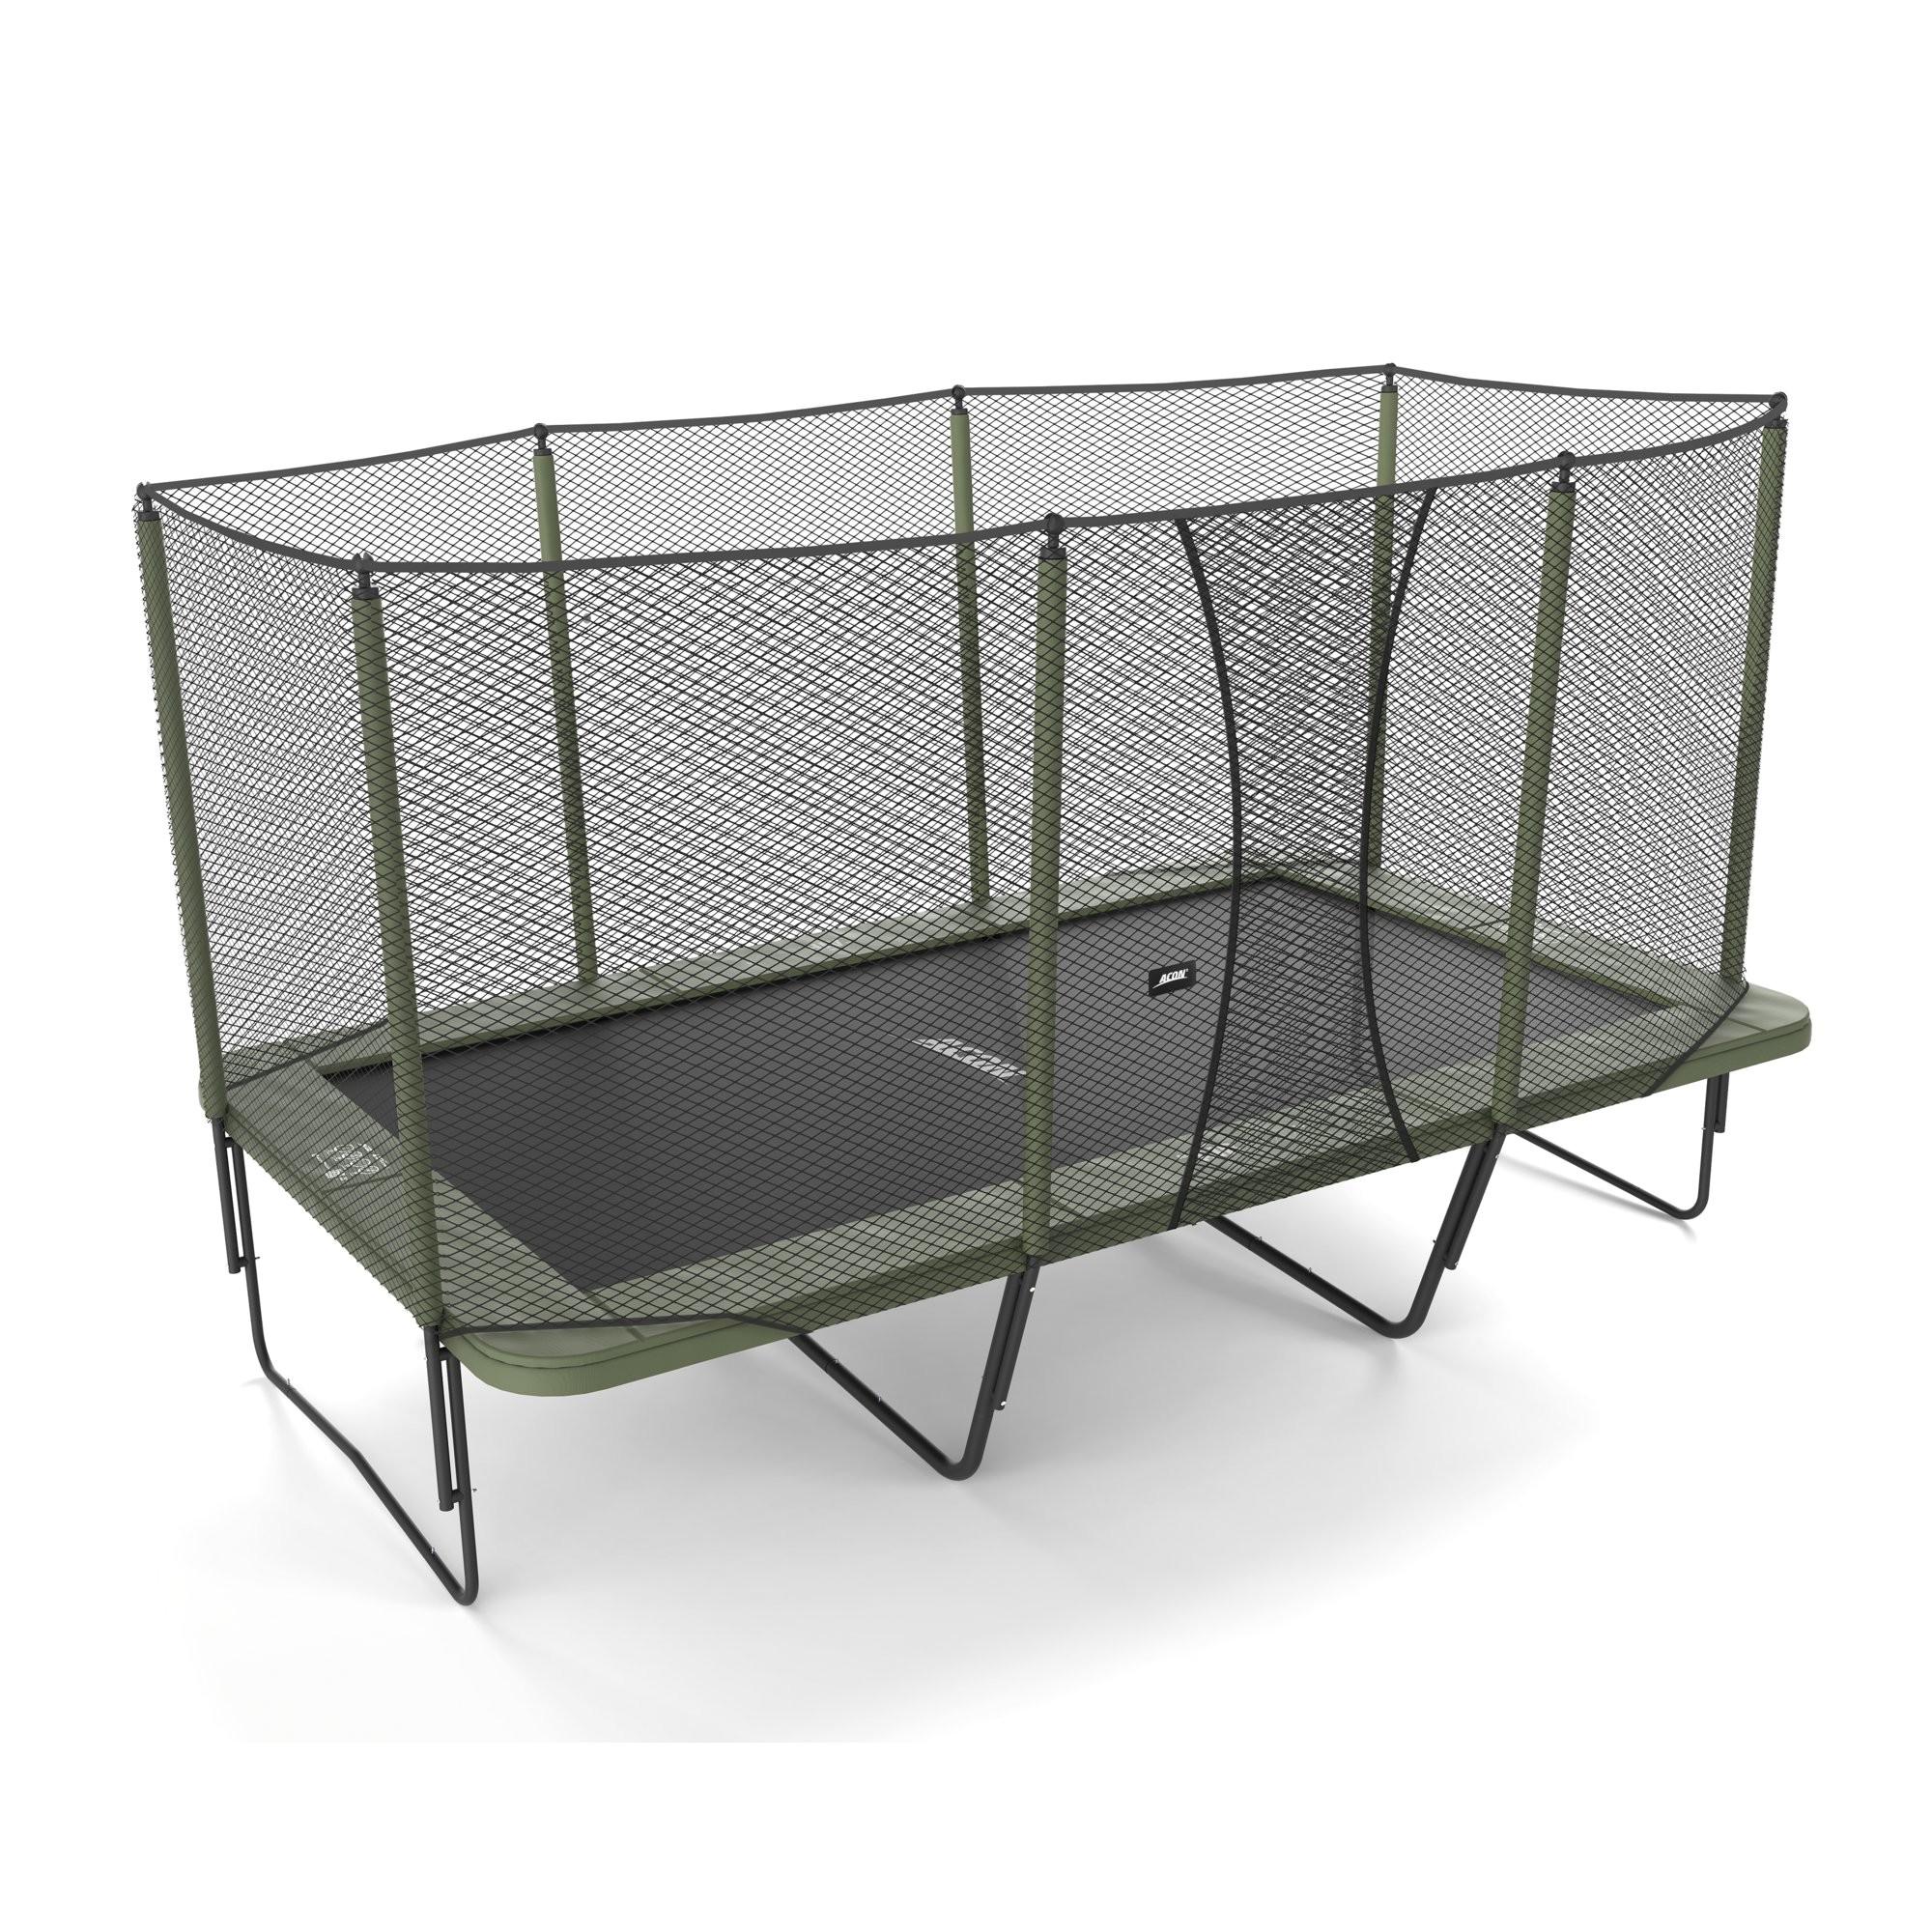 acon usa air 16 sport trampoline with enclosure acnu1000